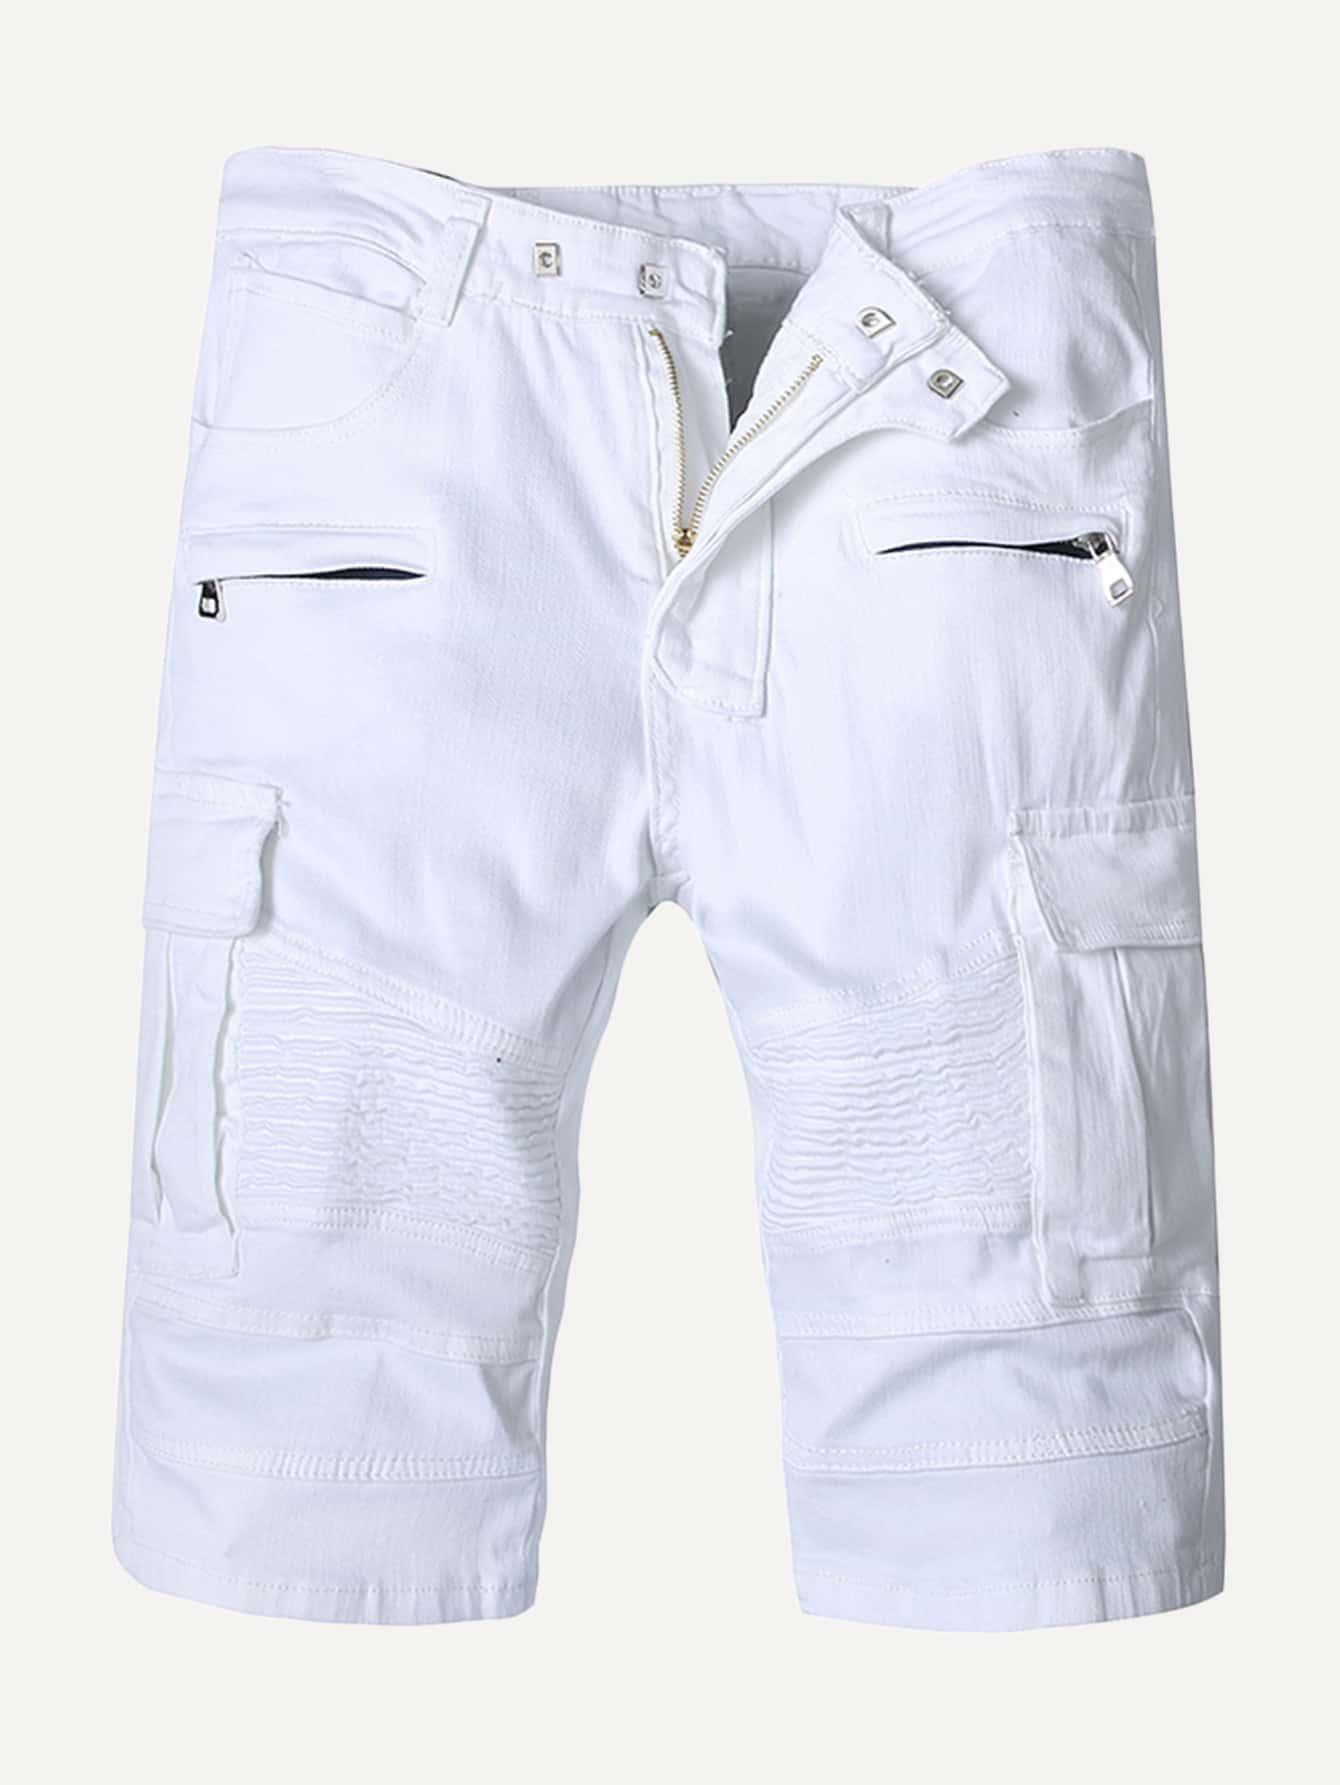 Men Zip Decoration Make Old Pants